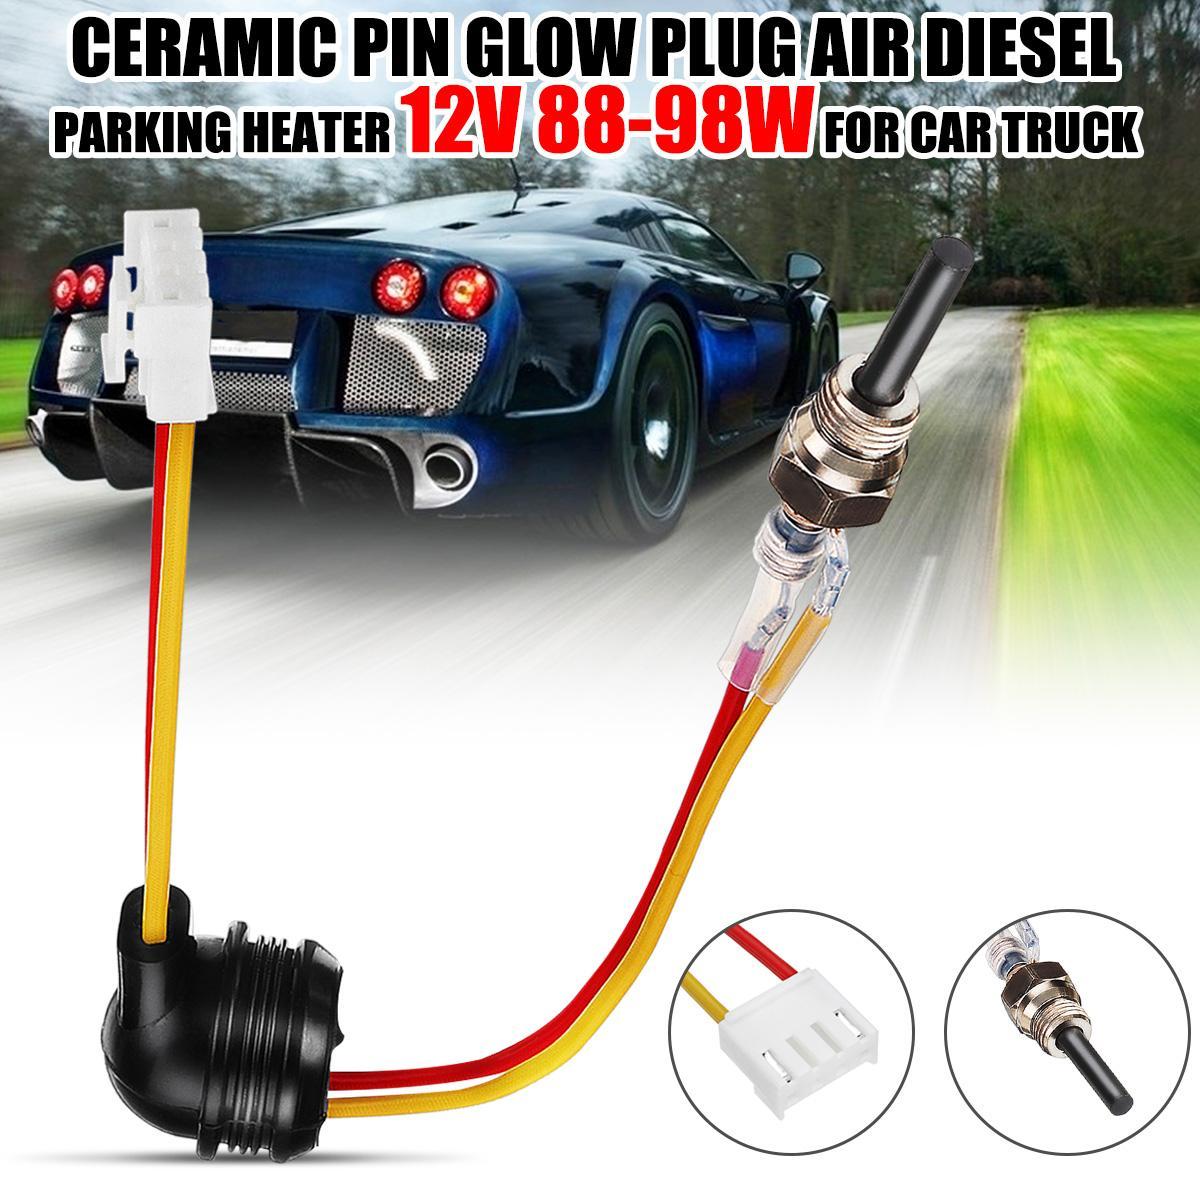 Heater Parts,car Heater Parts,car parts heater core,car heater auto parts